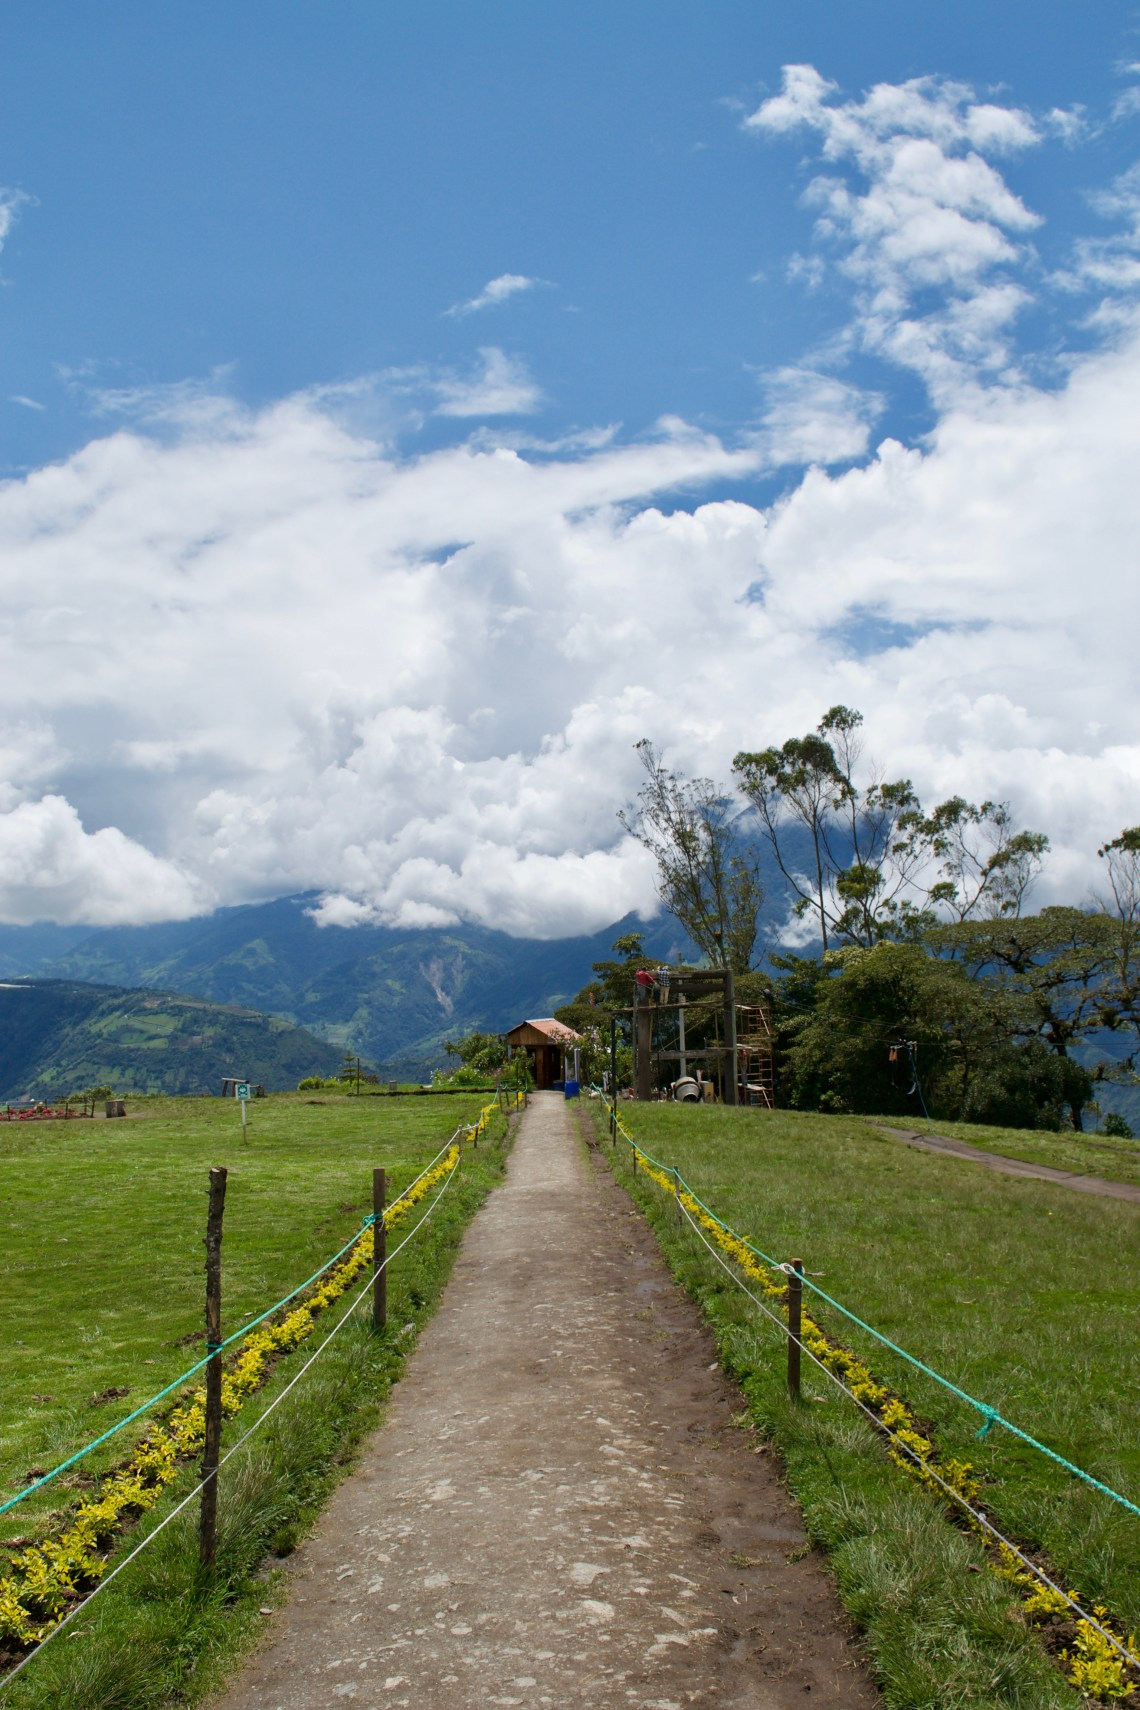 Swing At The End of the World, Banos, Ecuador